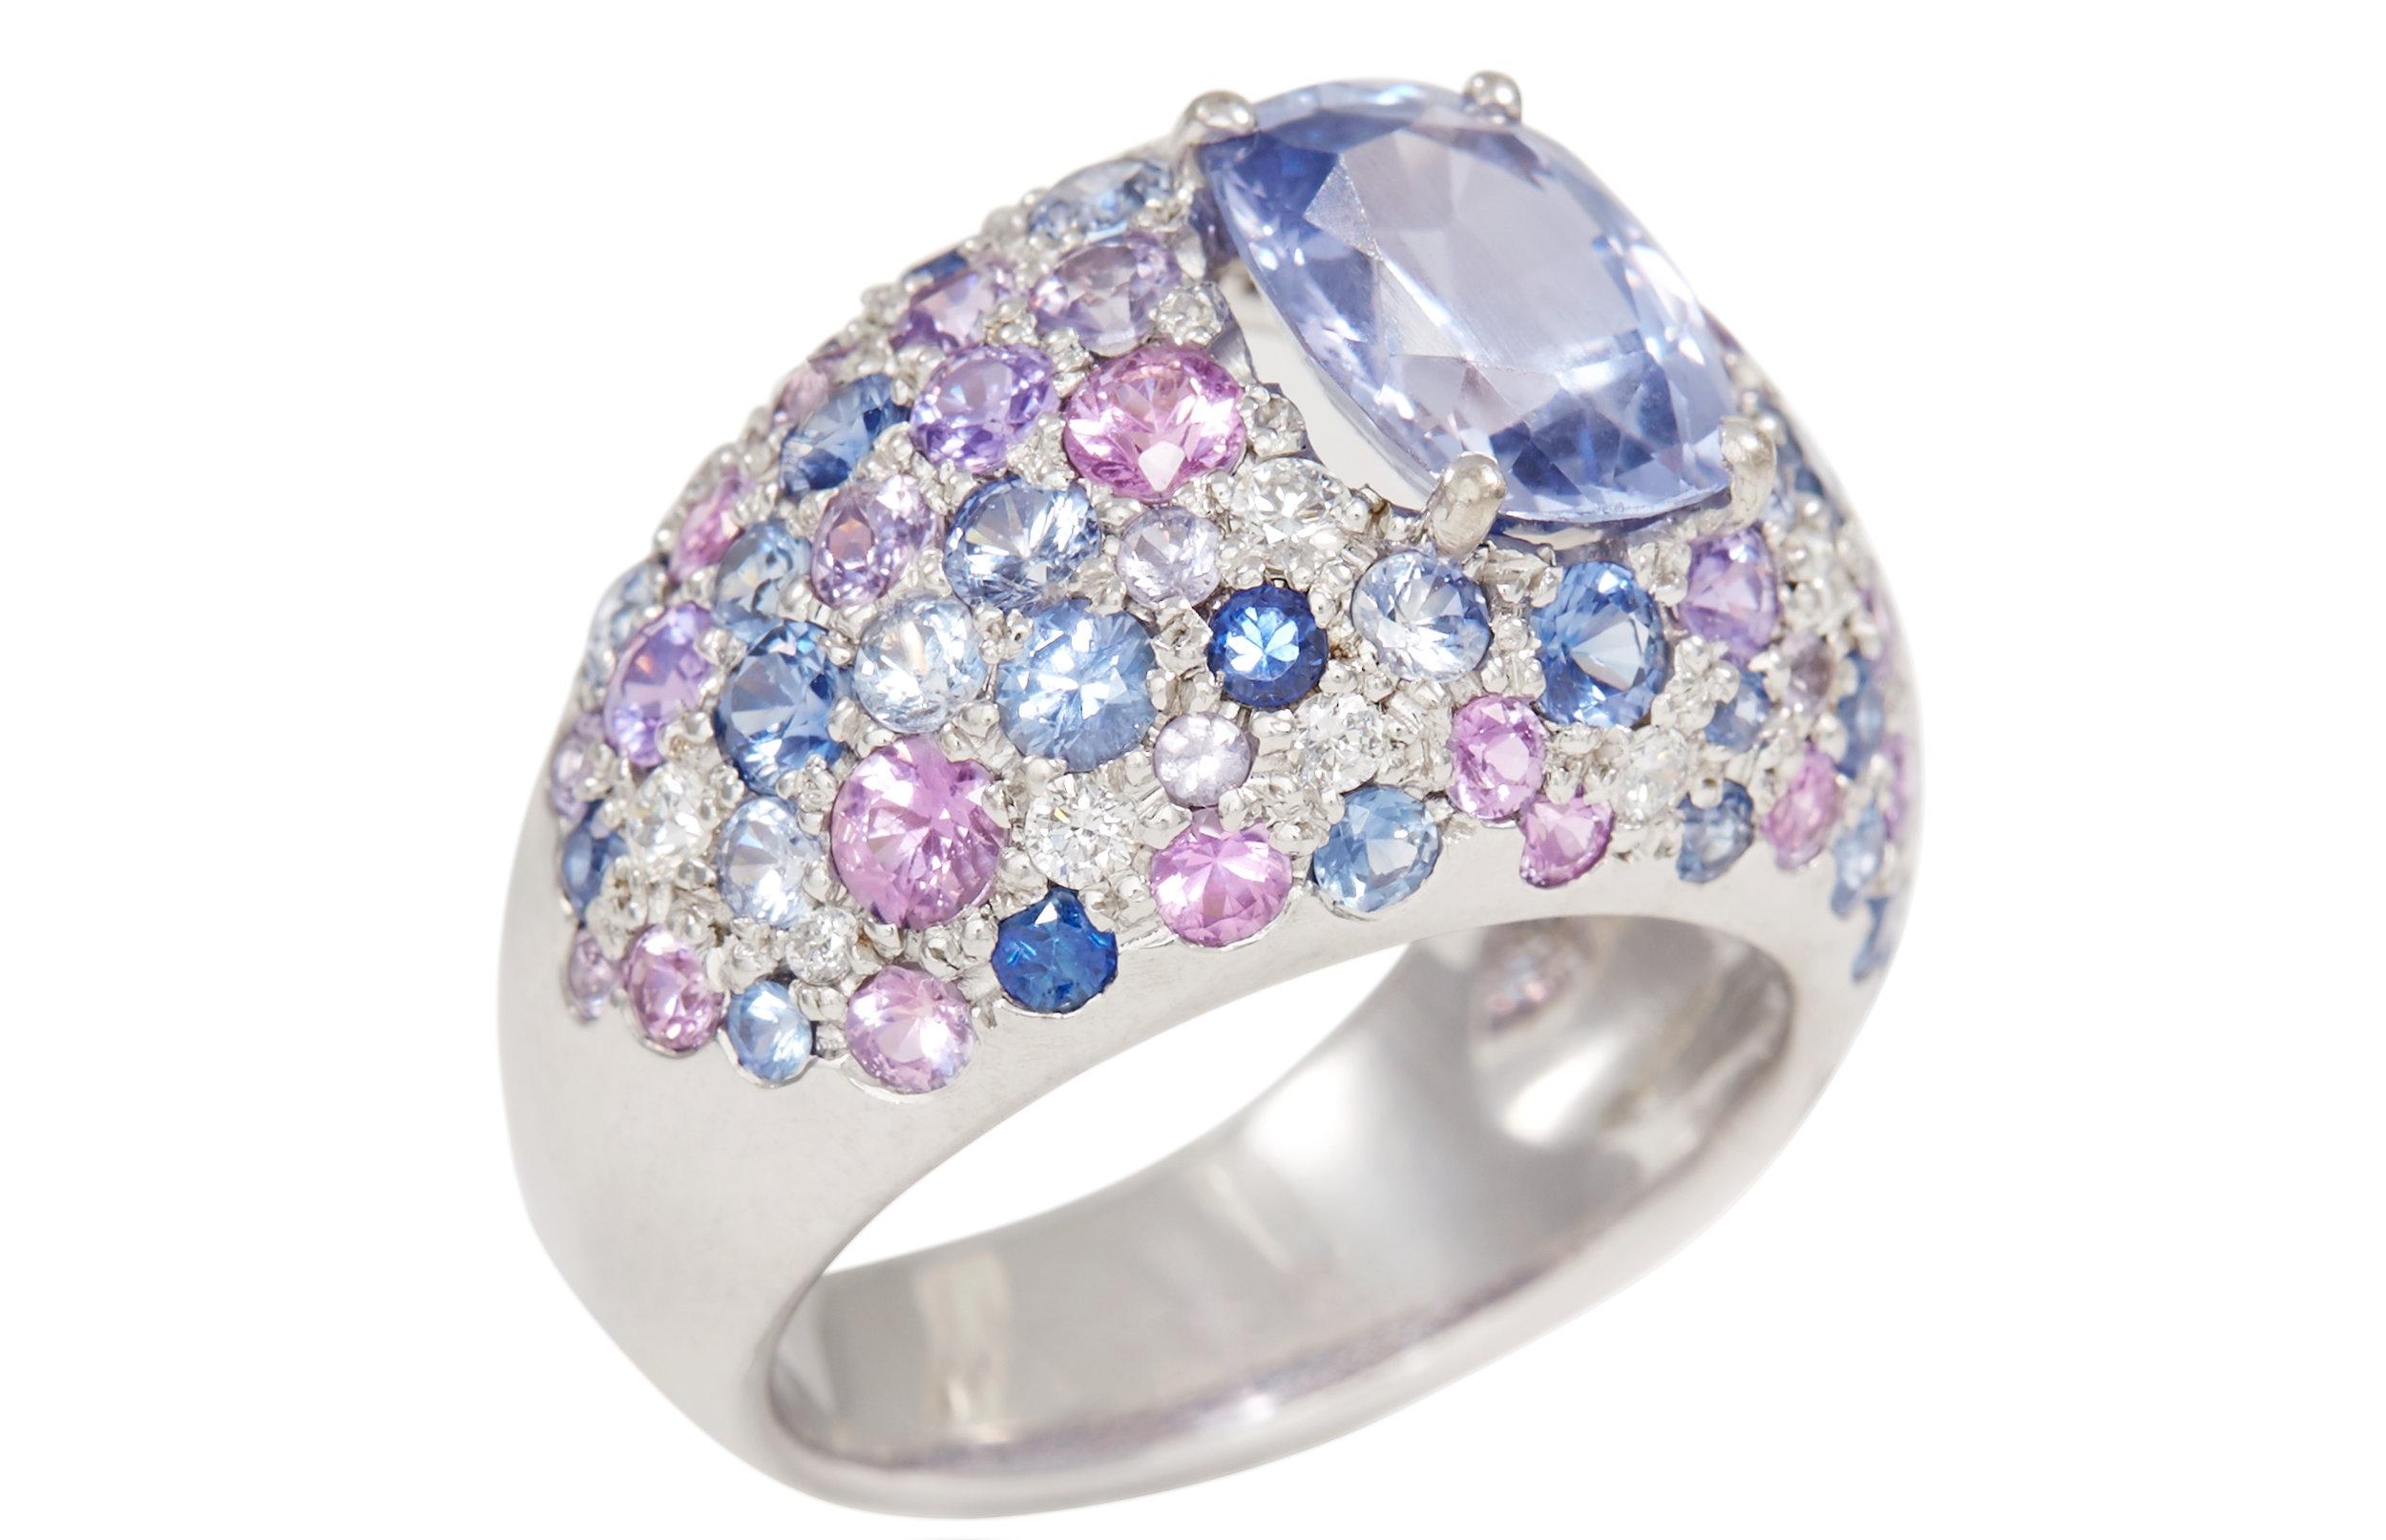 03_Bombe_Violet_Sapphire_Ring_v2_High_Res_sRGB.jpg